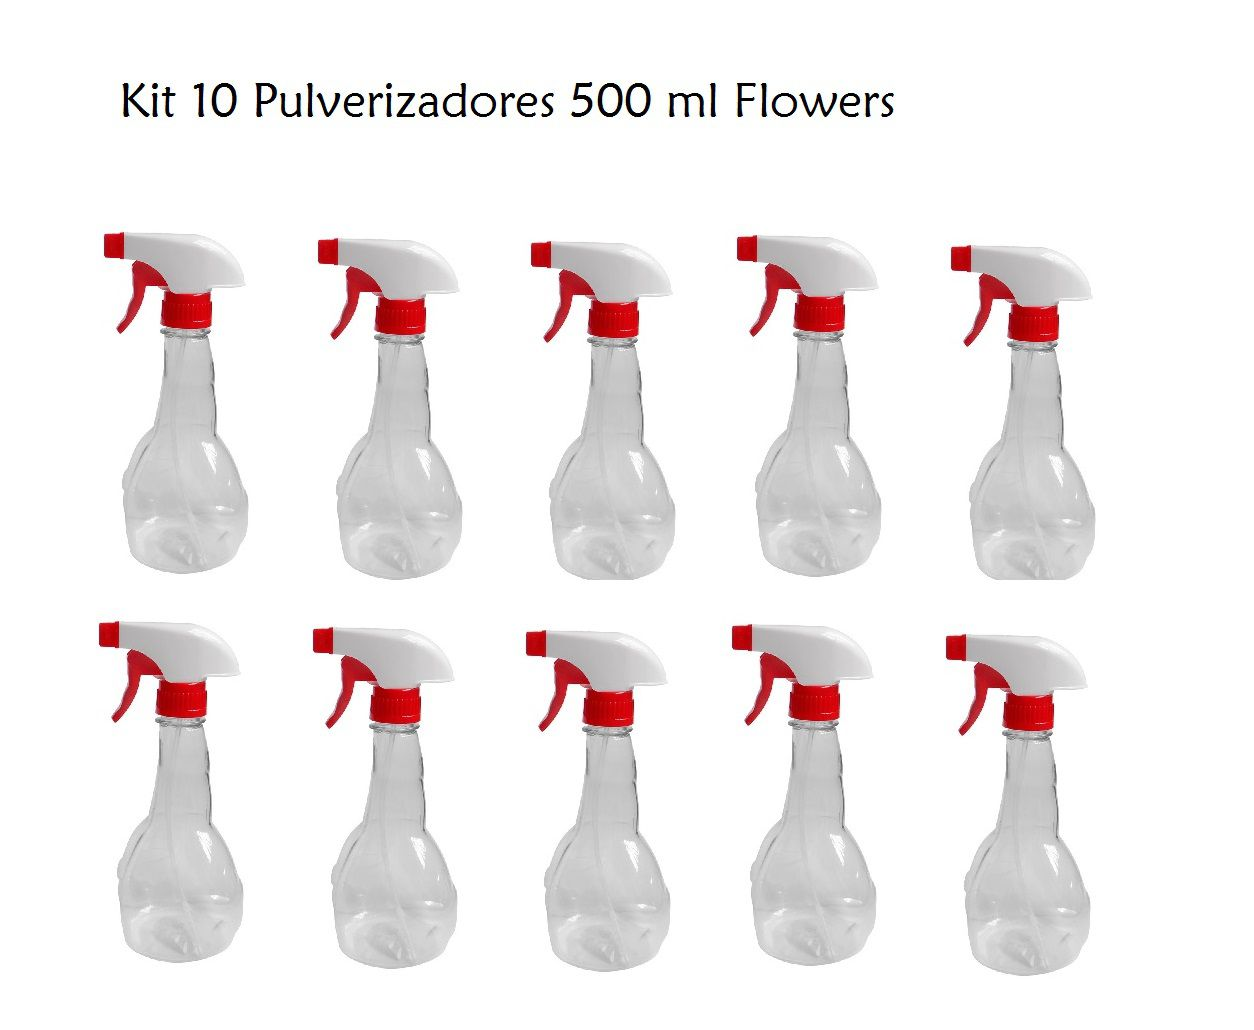 Kit 10 Pulverizador Flowers 500 ml